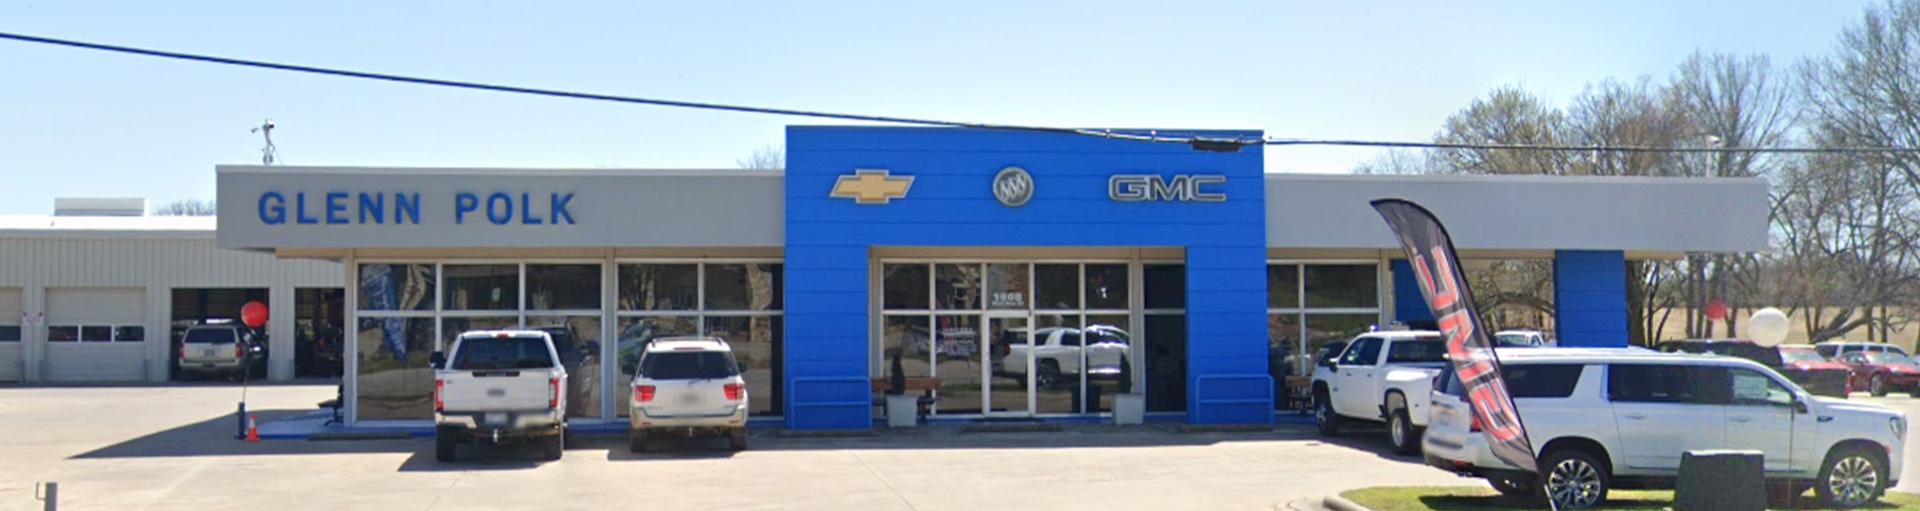 Glenn Polk Chevrolet Buick GMC Service Specials